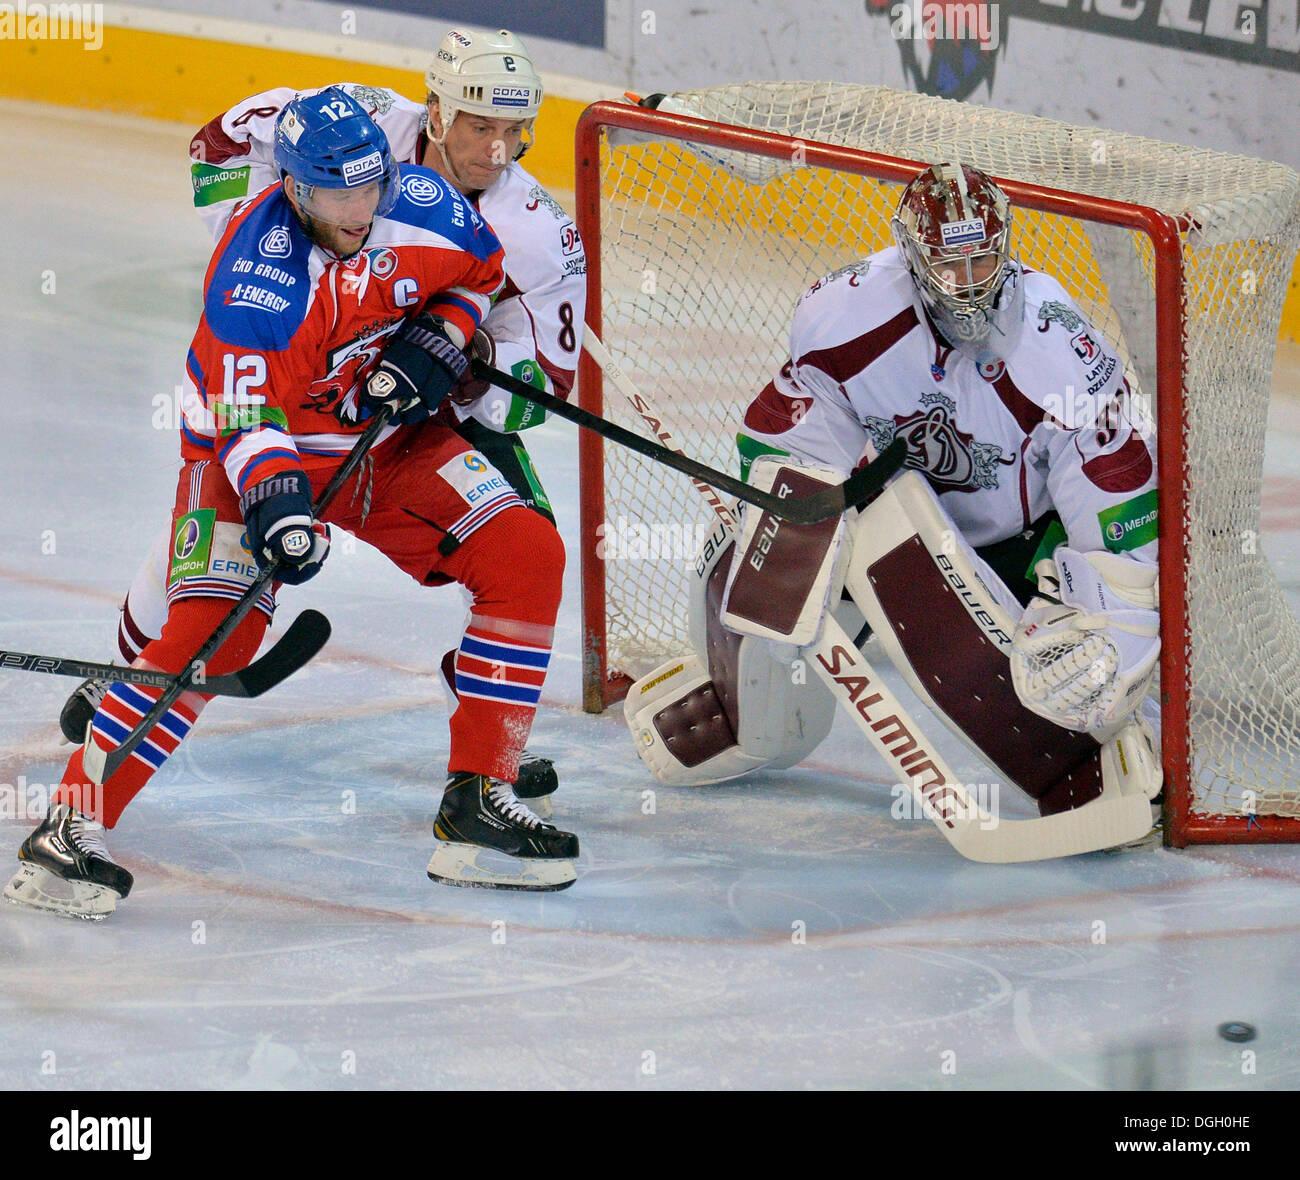 Girou Alexander - Canadian hockey striker, who played for the Riga Dynamo